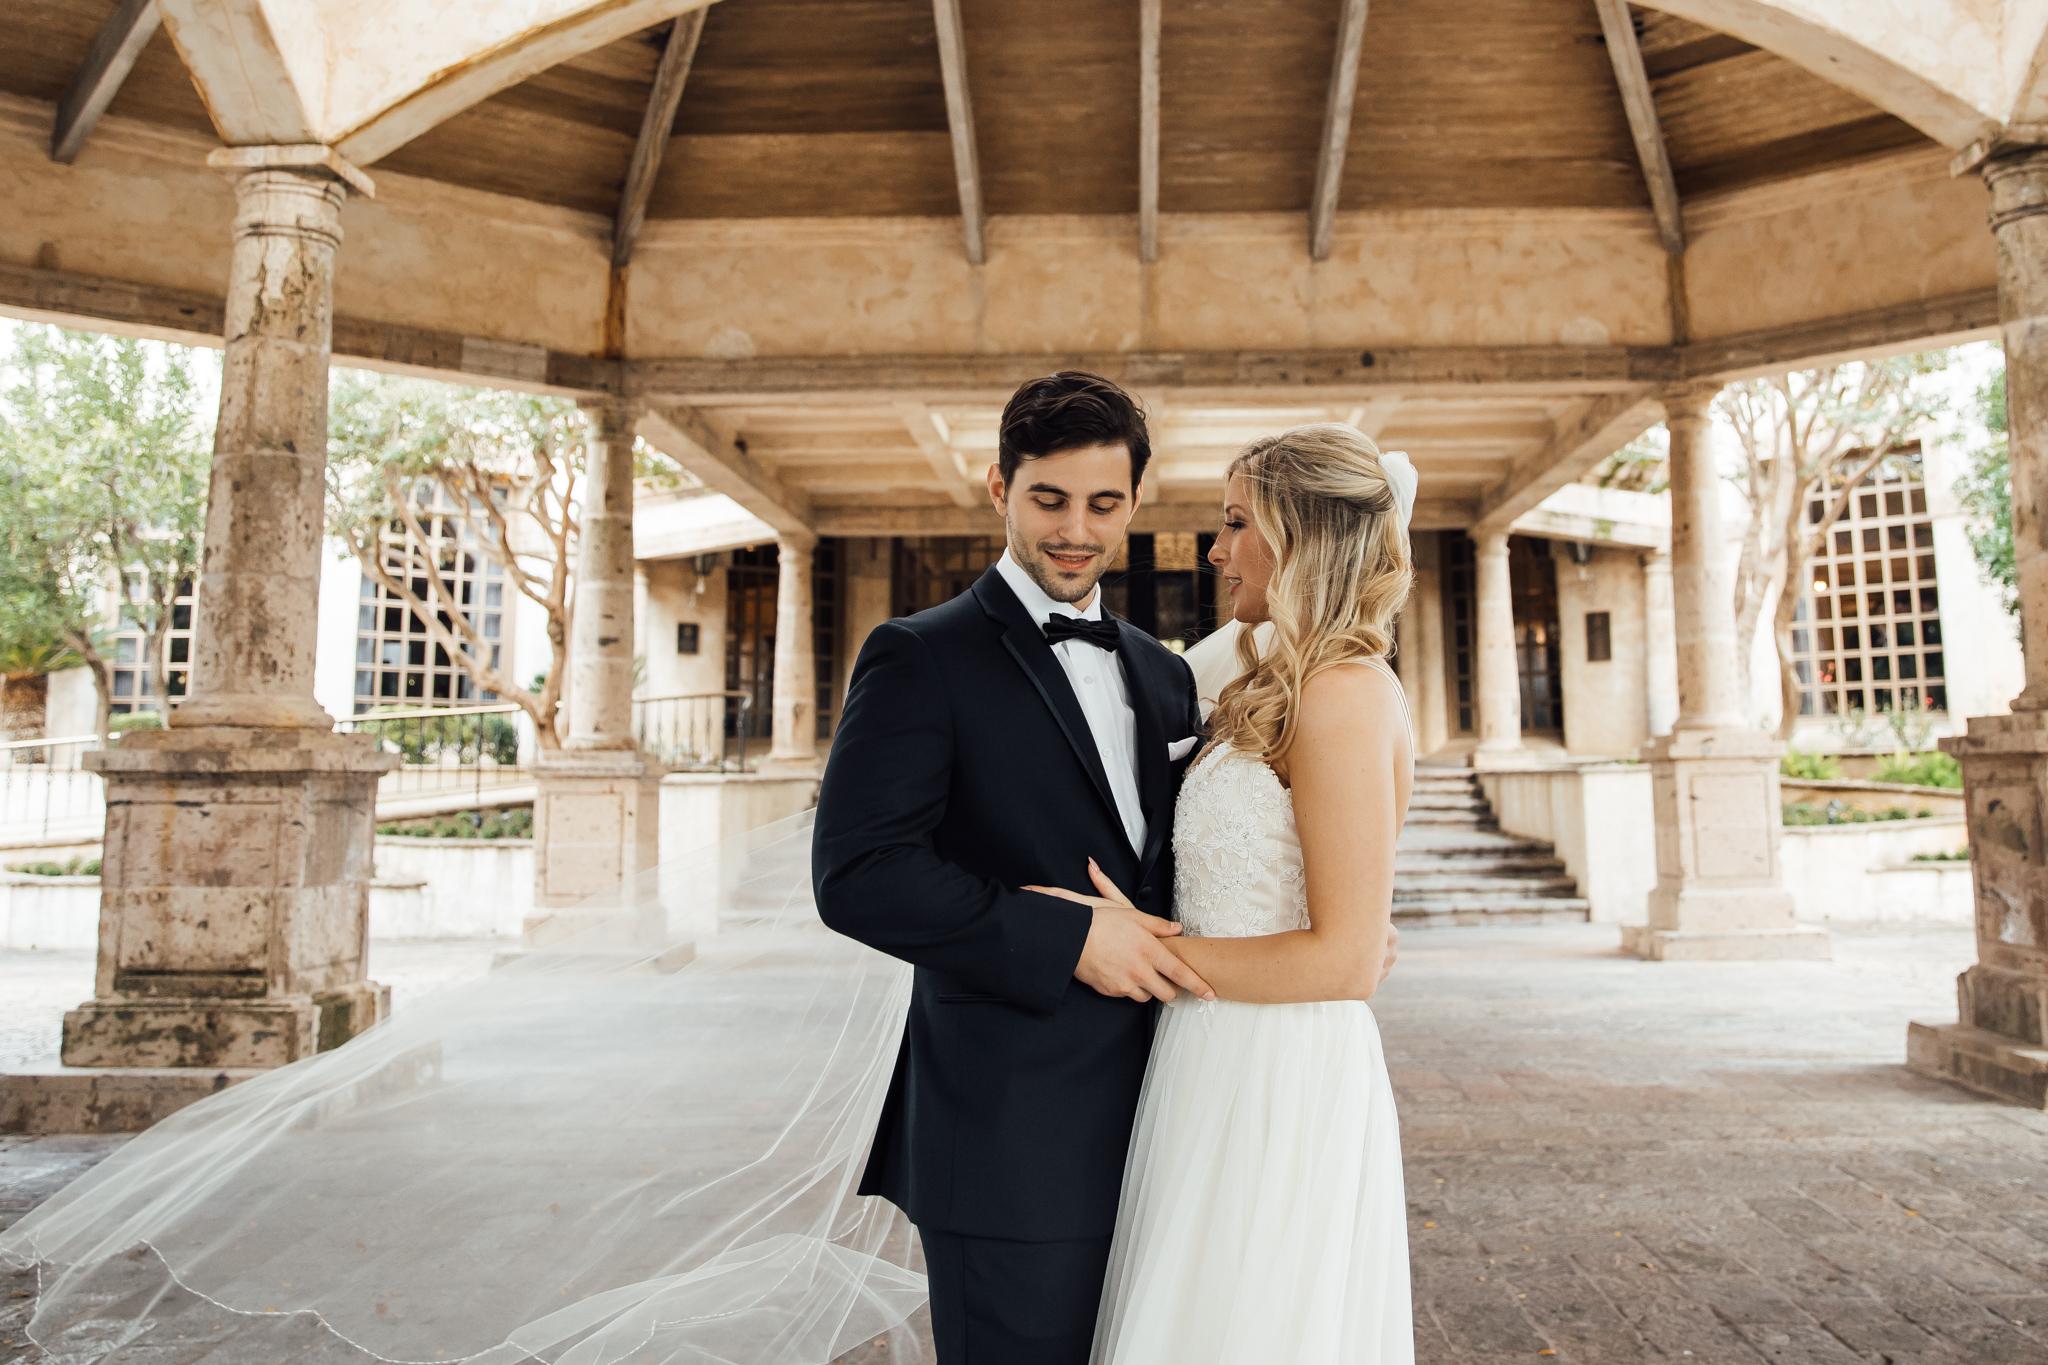 Wedding Dress Resale.Wedding Dress Resale Shops San Antonio Raveitsafe